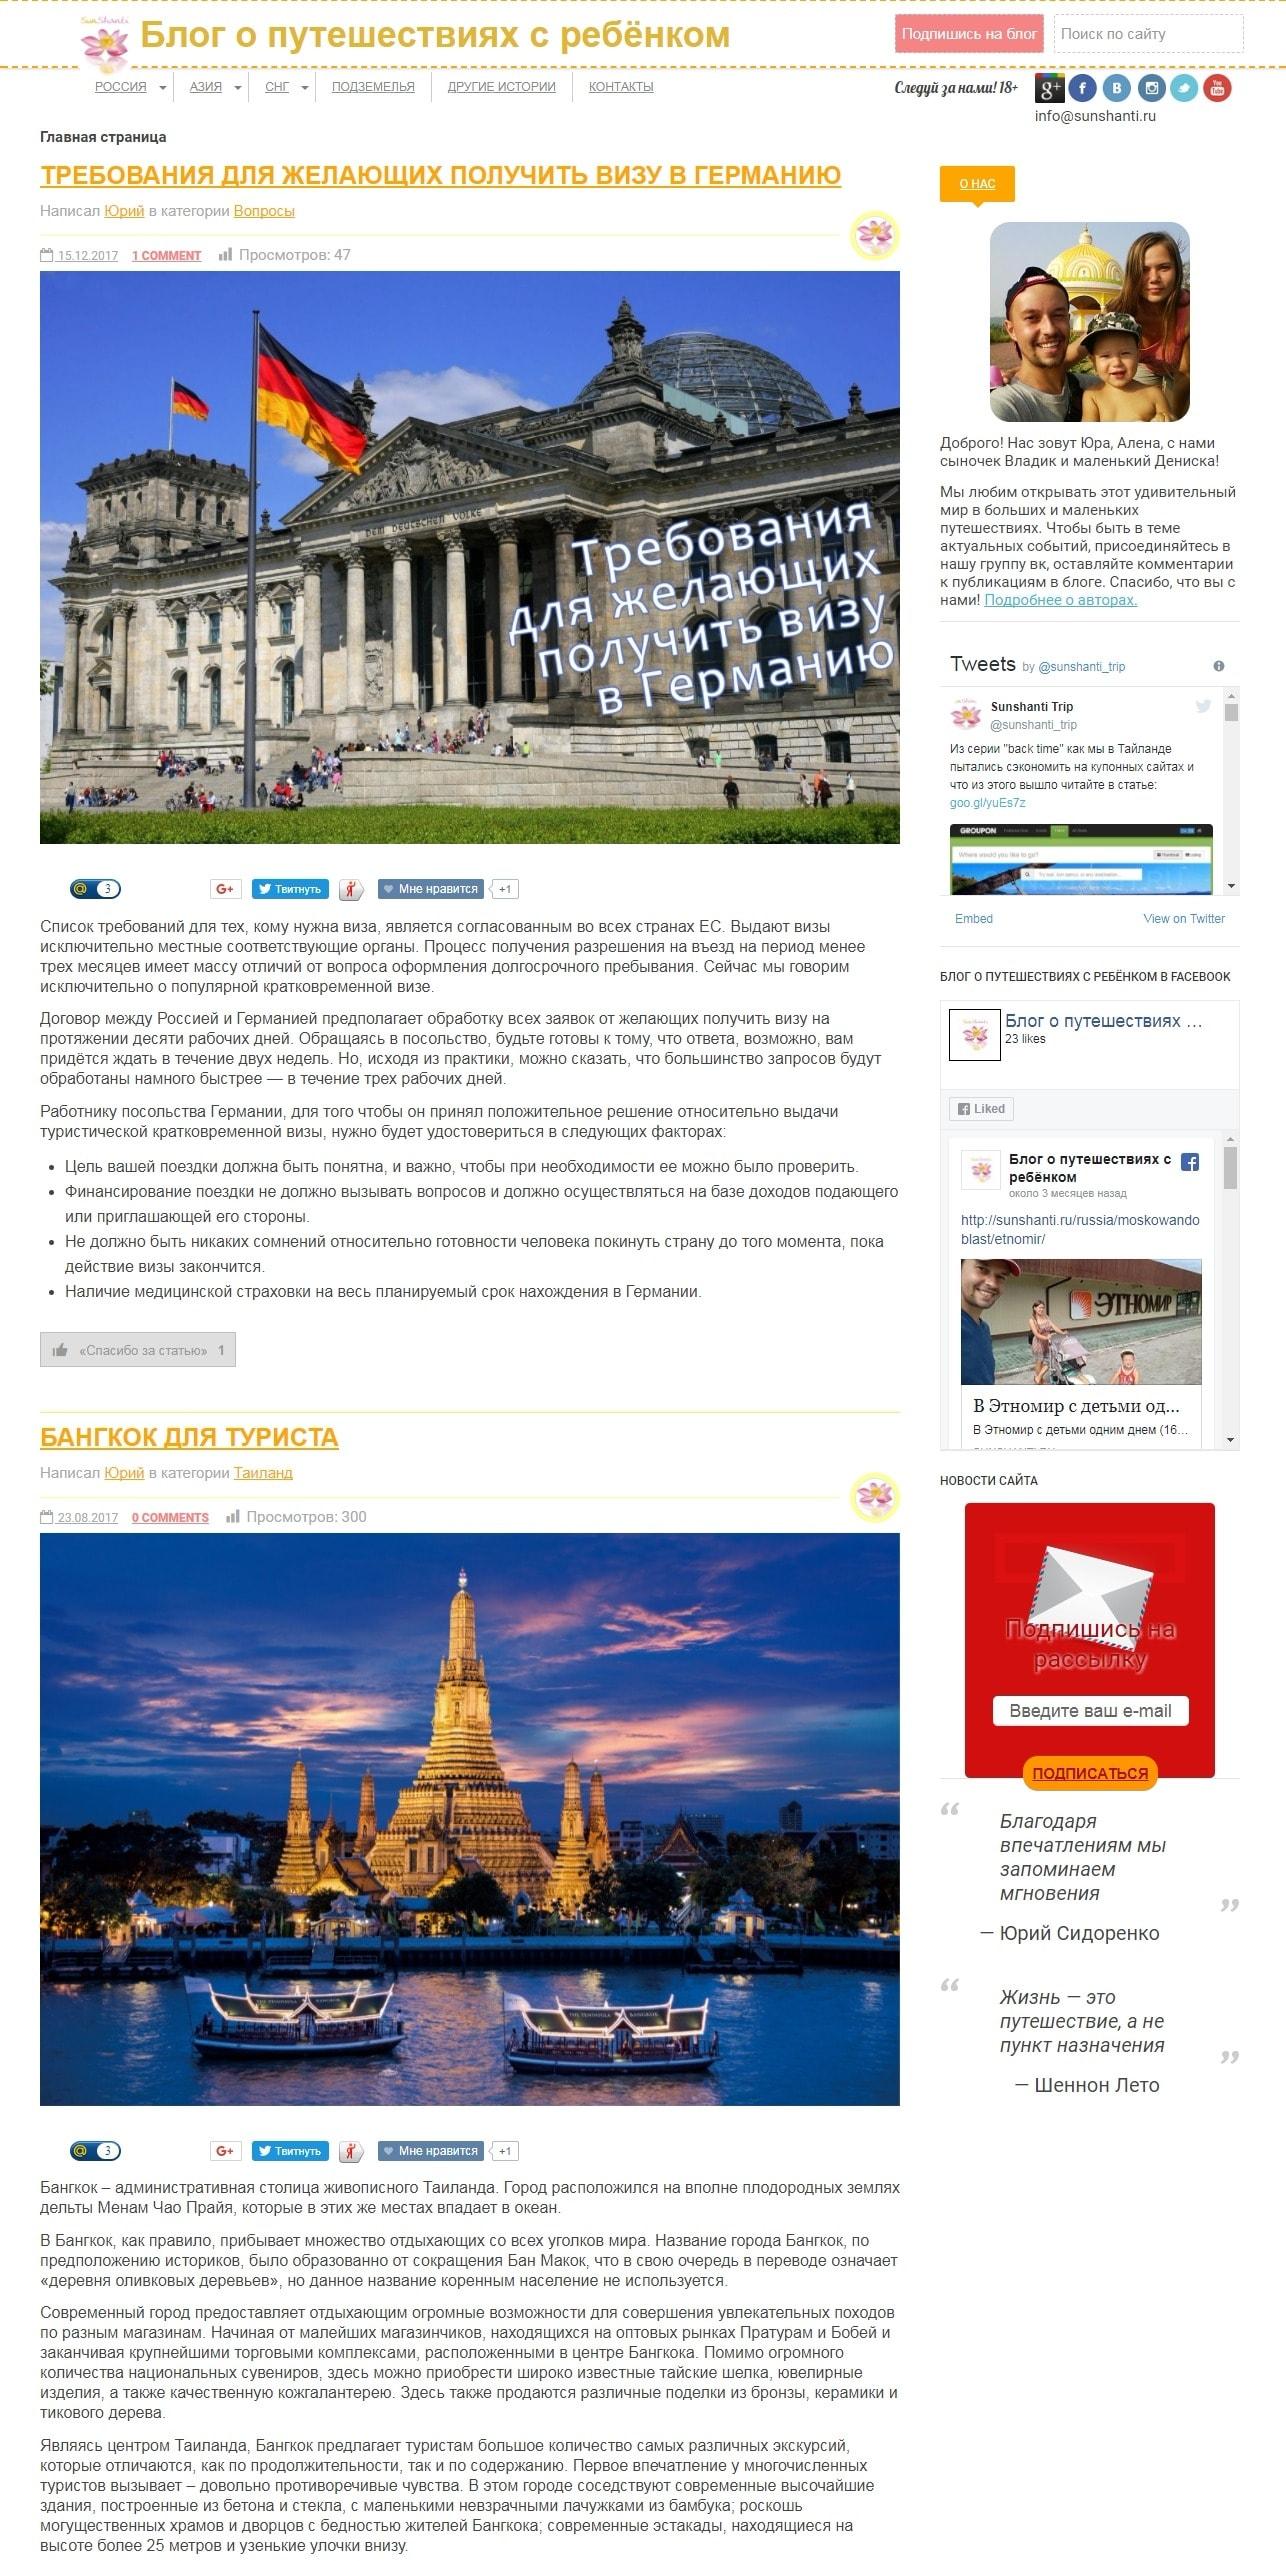 Интернет-журнал о путешествиях